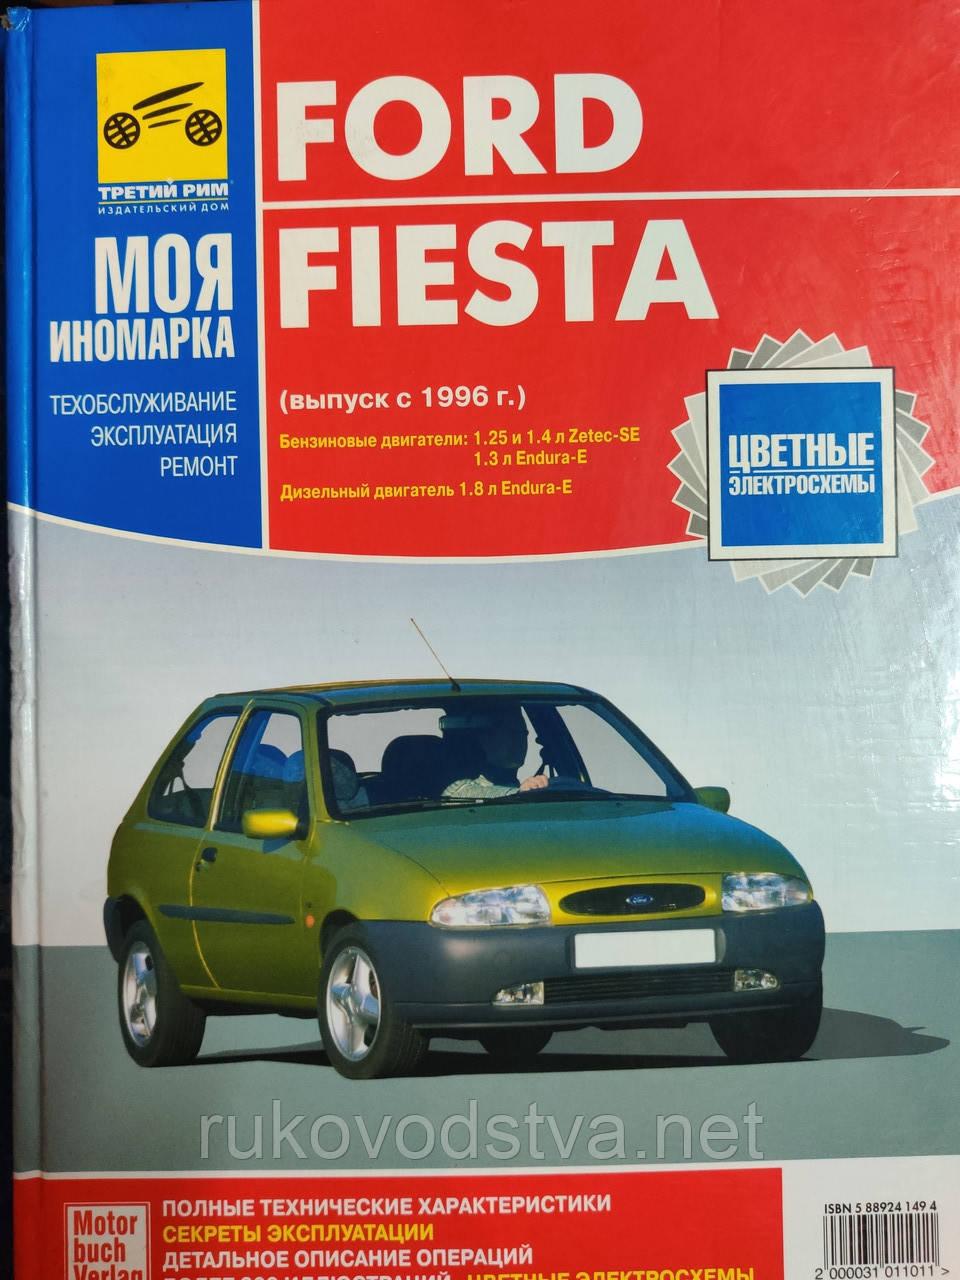 Книга Ford Fiesta MK4 c 1996 Эксплуатация, обслуживание, ремонт